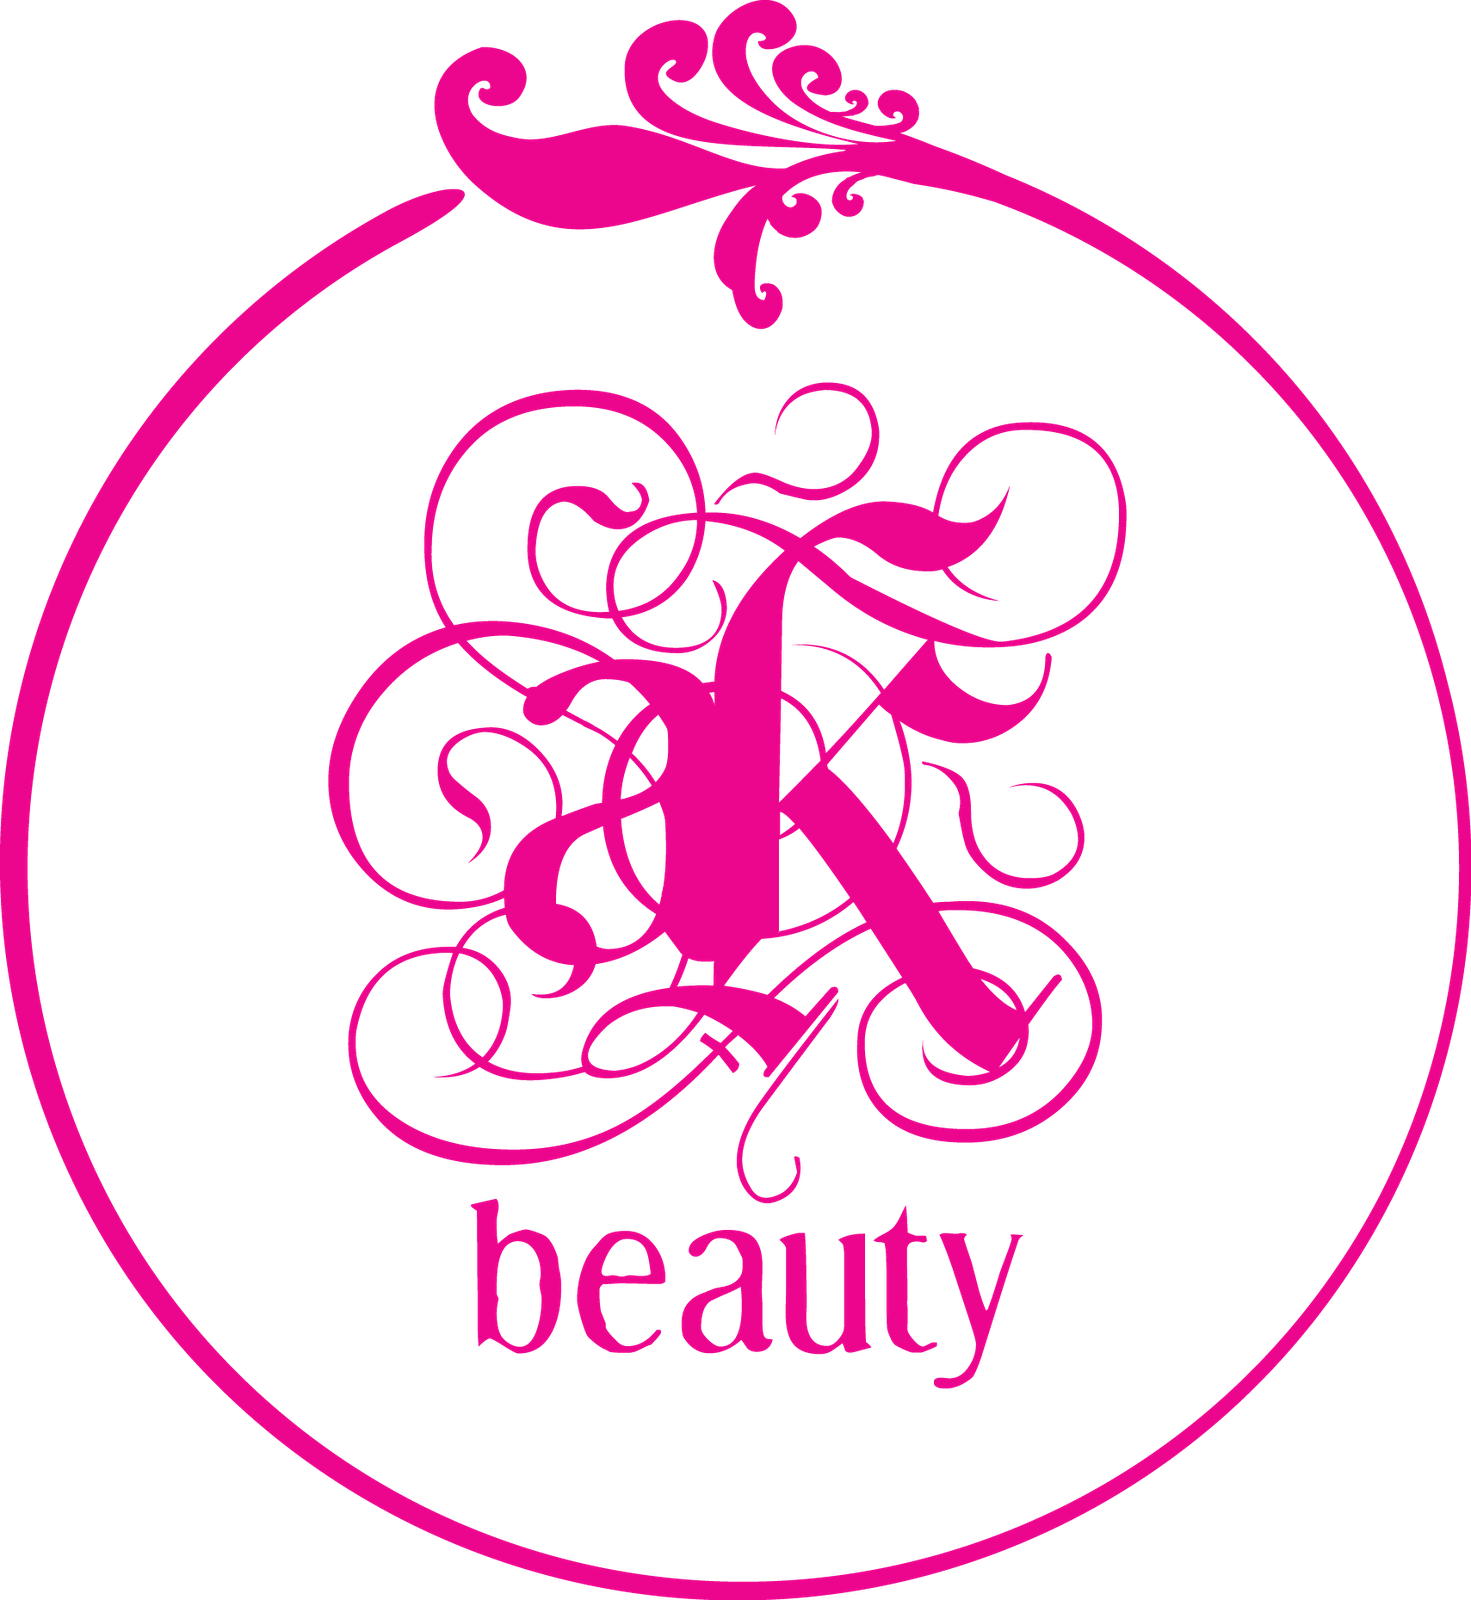 Beauty Logo Design  Free Online Design Tool